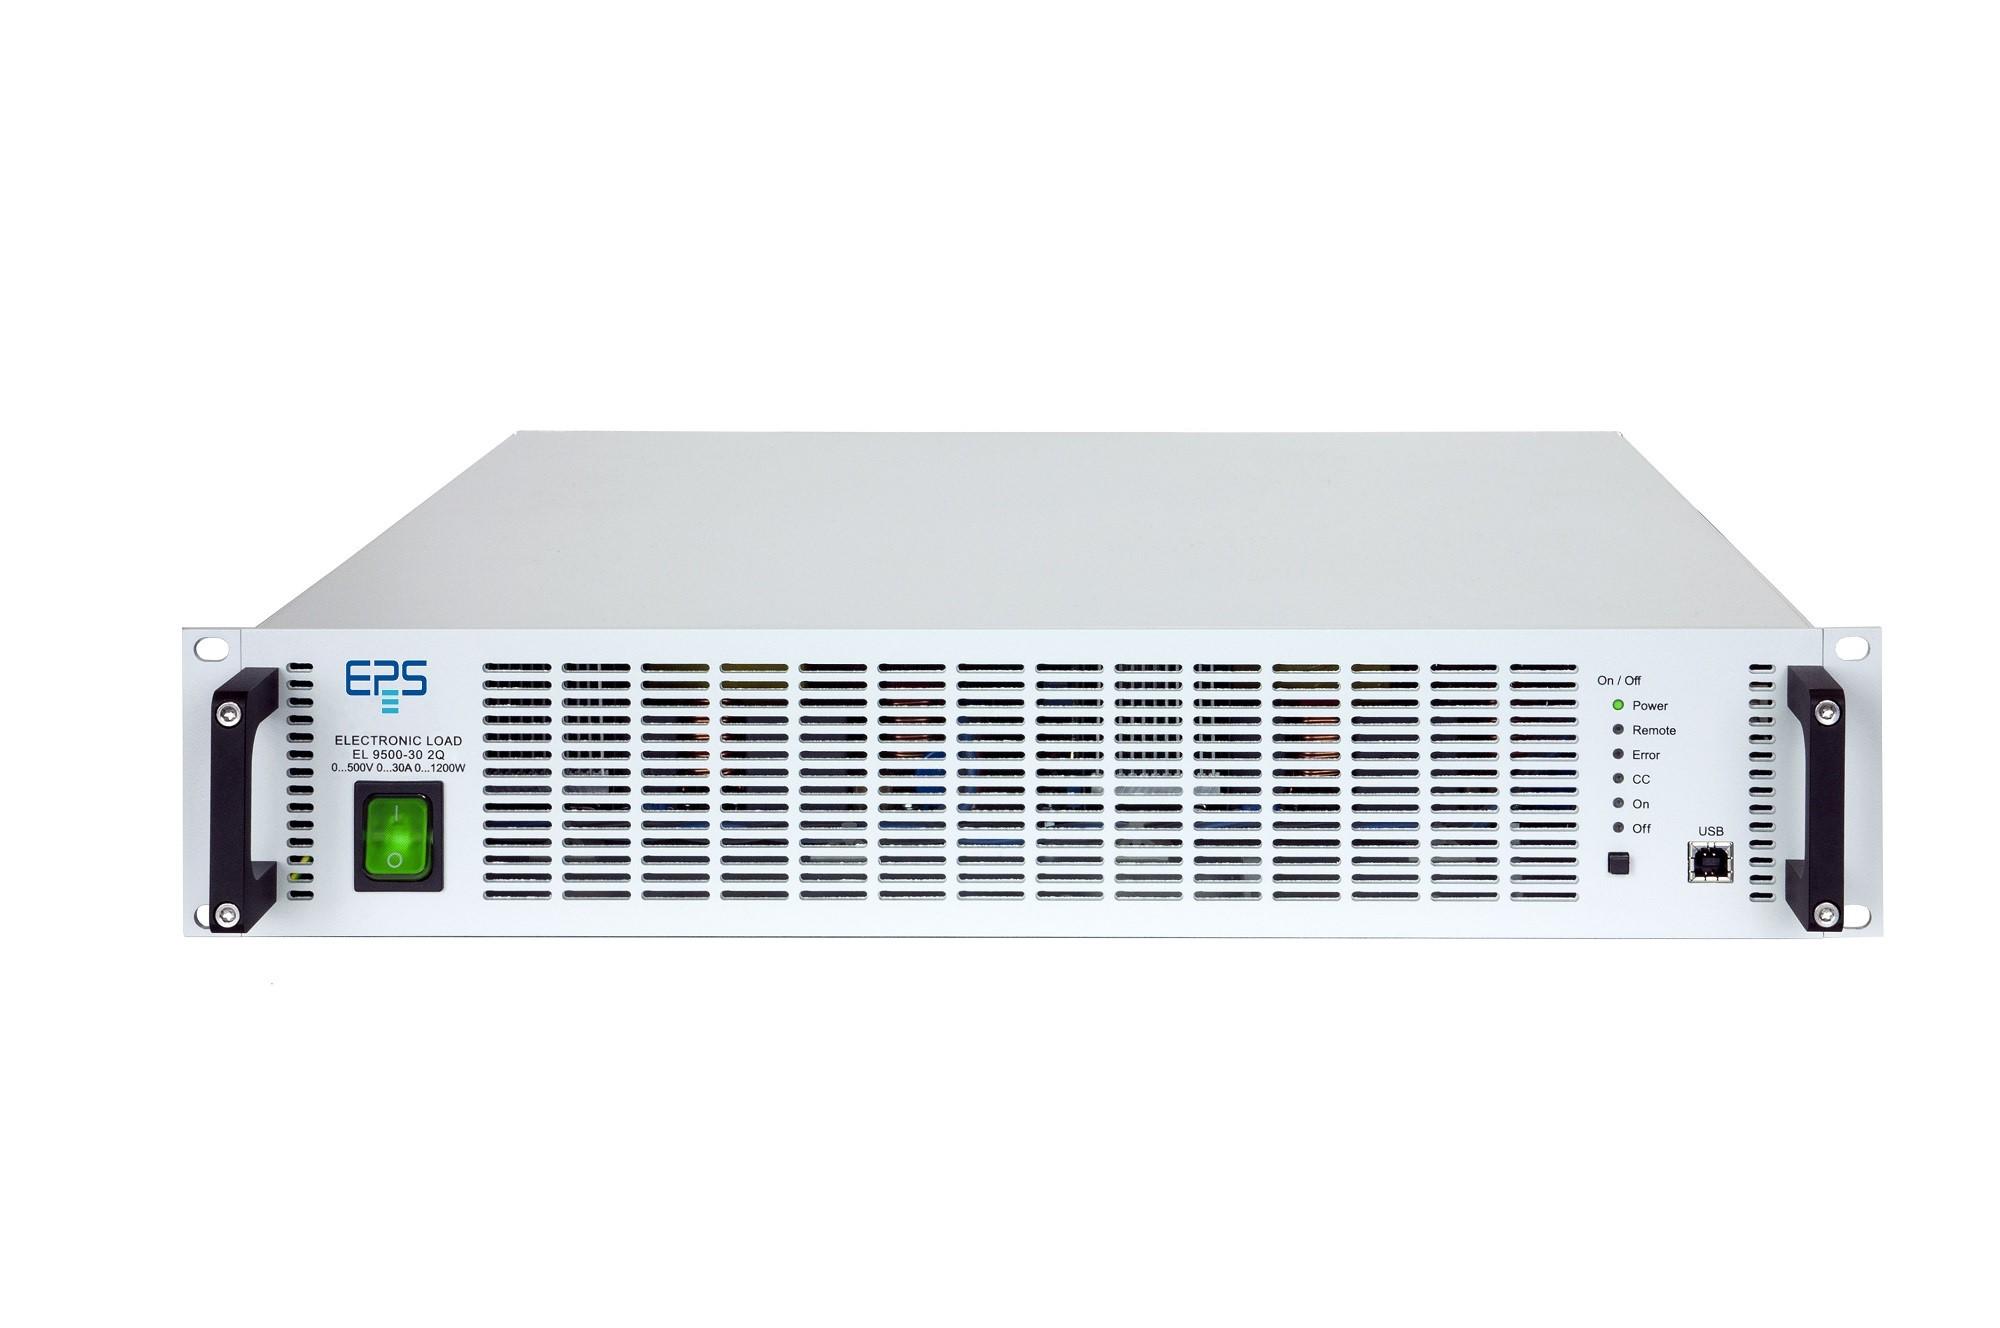 EPS/EL 9000B 2Q  Elektronische Last 600-2400 W